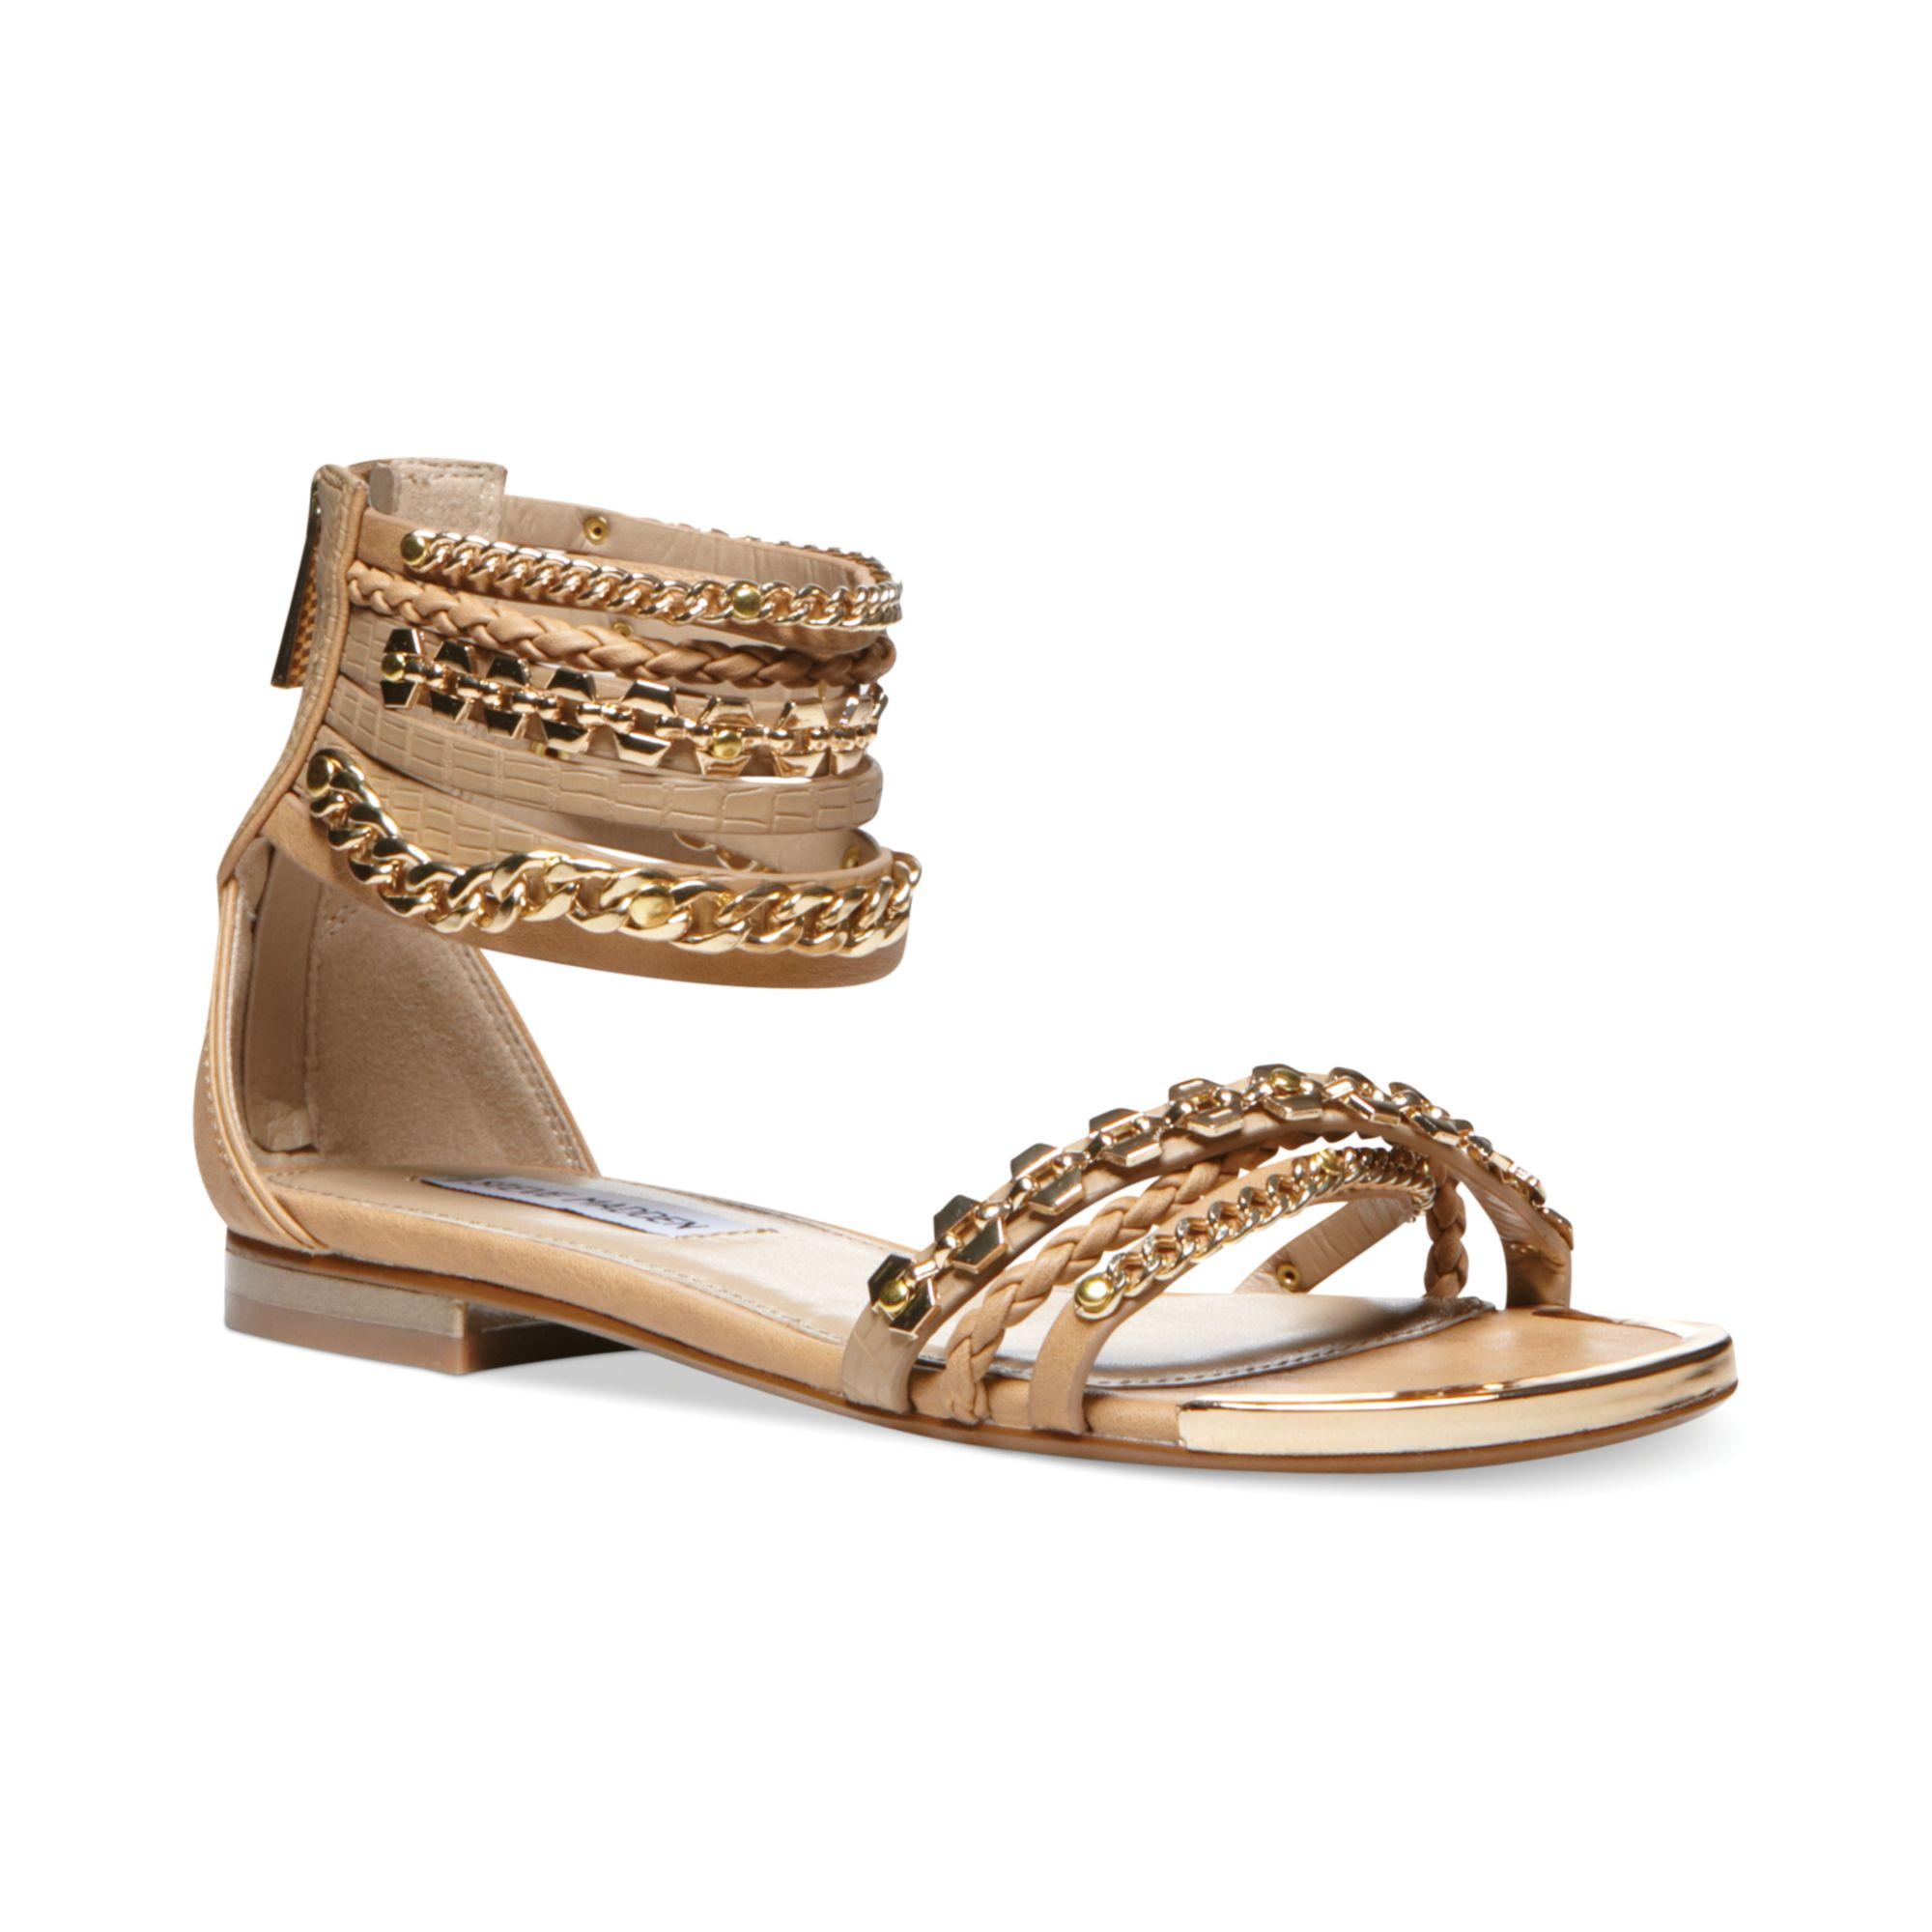 steve madden womens lawful flat sandals in metallic lyst. Black Bedroom Furniture Sets. Home Design Ideas